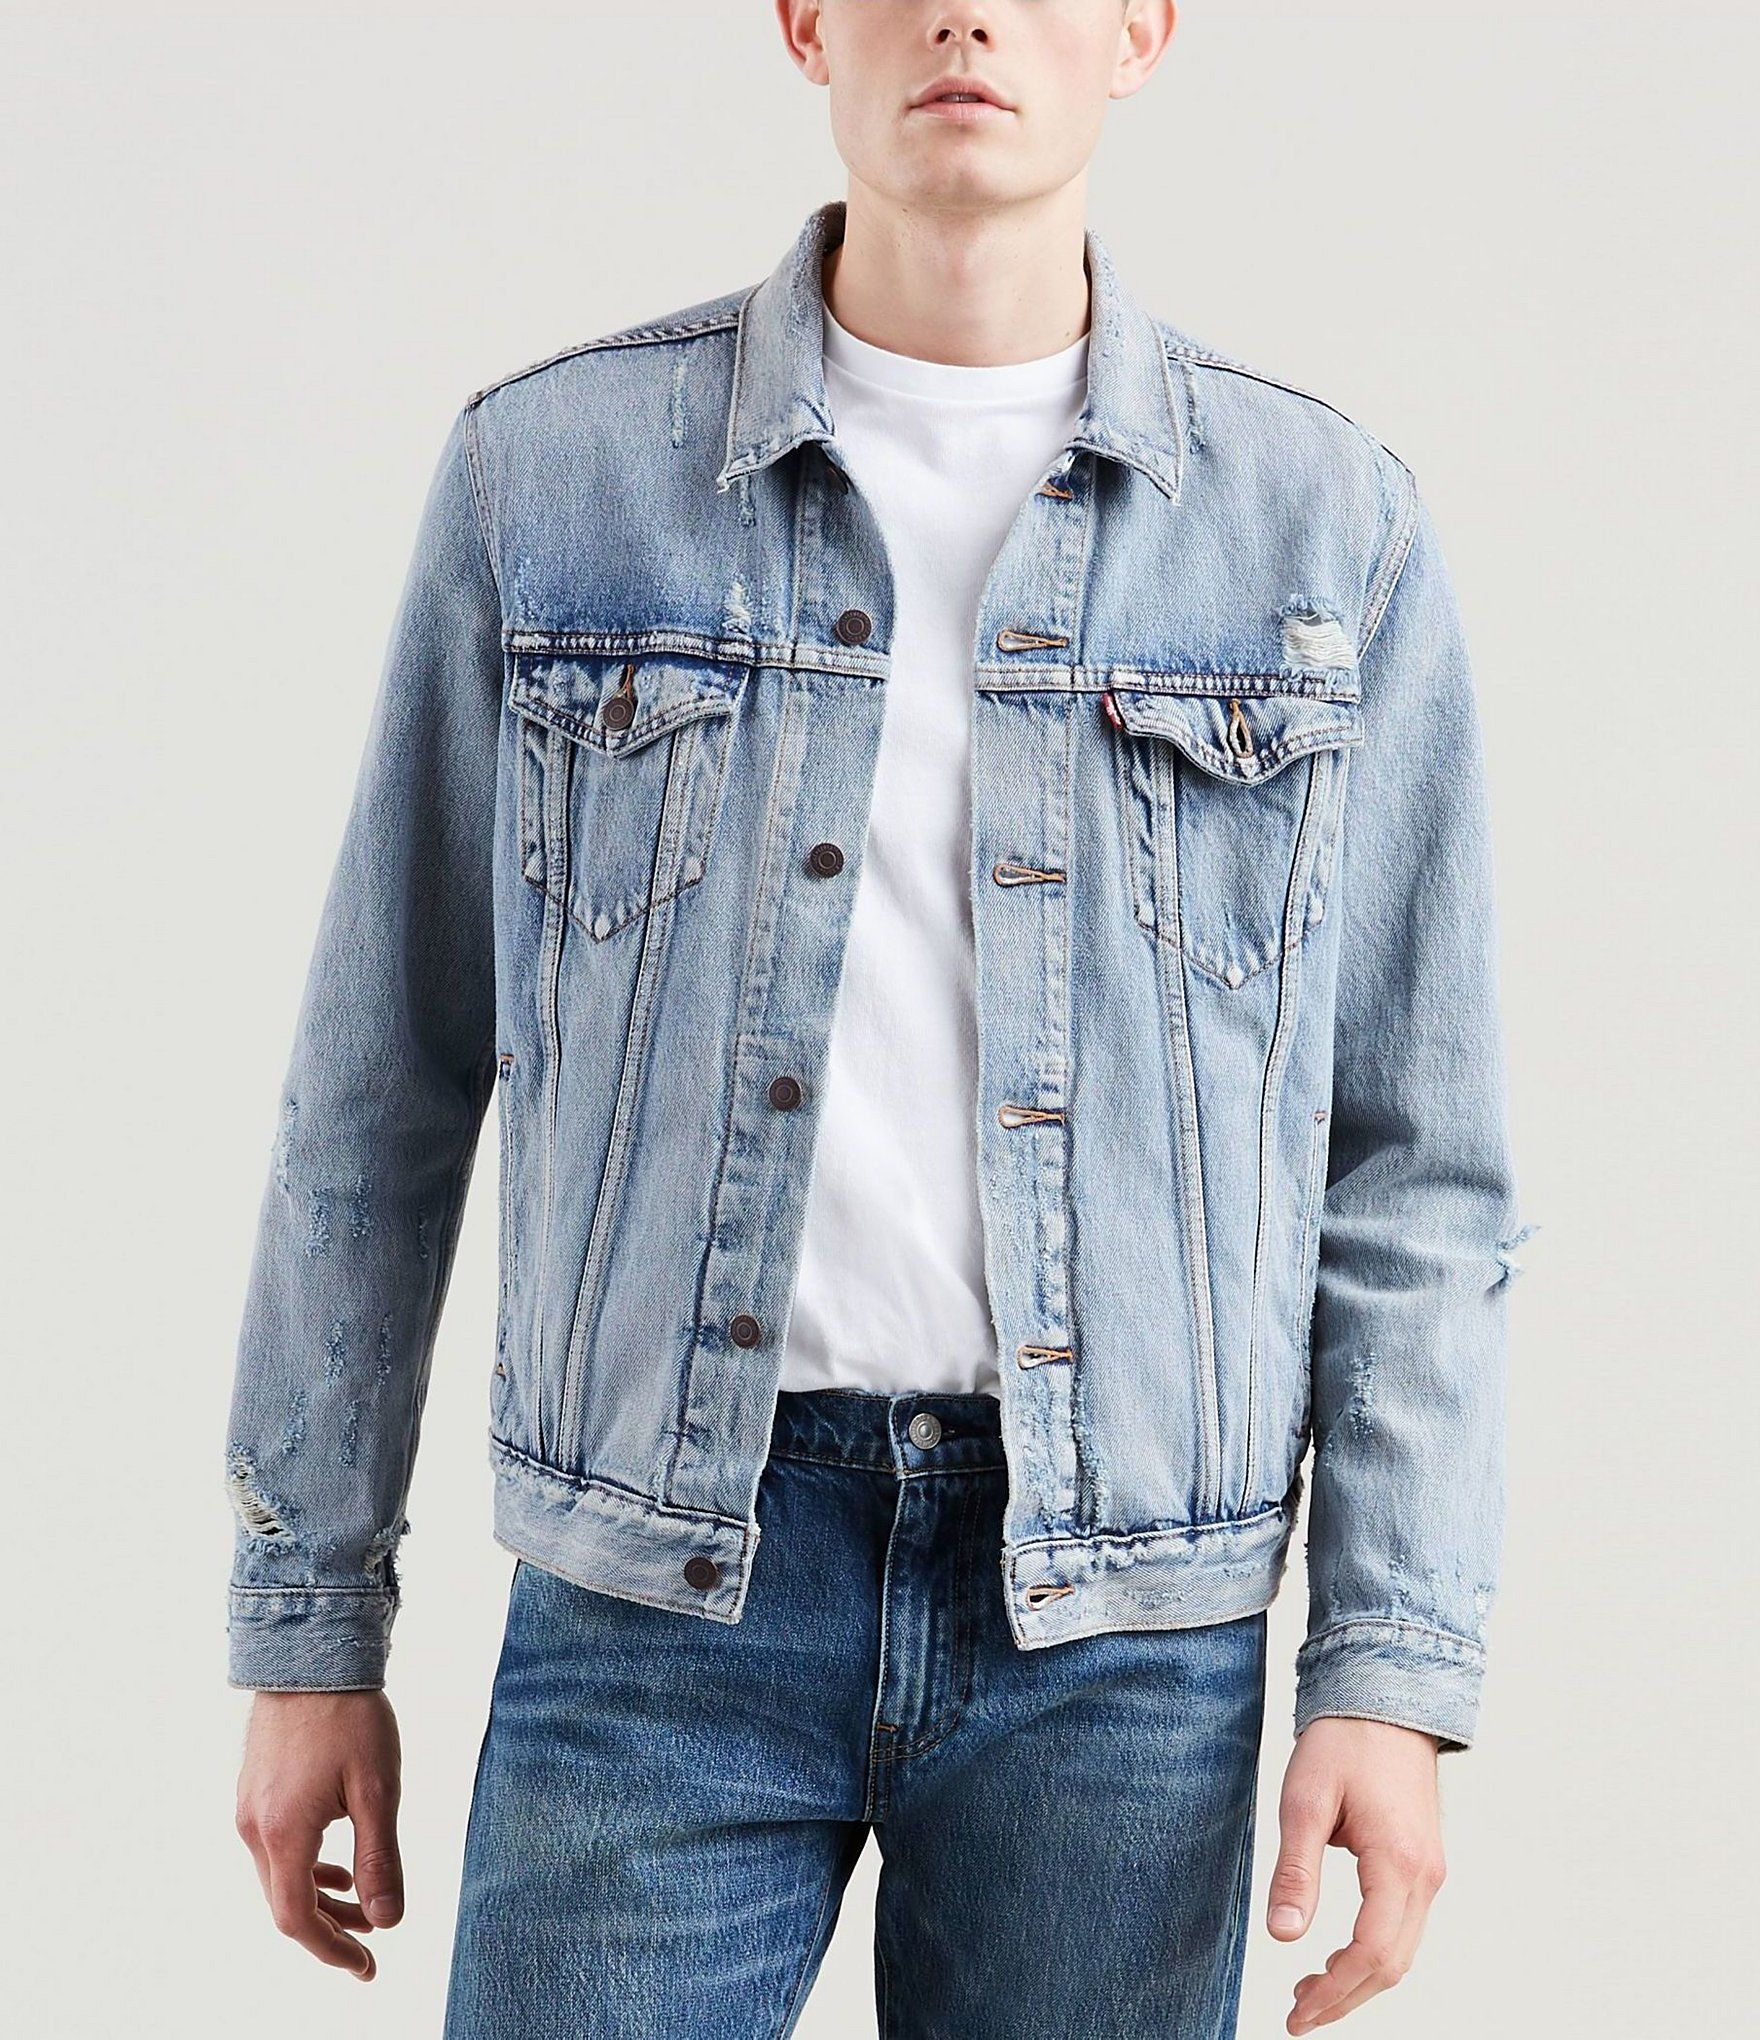 Levi S The Trucker Denim Jacket Dillard S In 2021 Denim Jacket Denim Jacket Men Jackets [ 2040 x 1760 Pixel ]